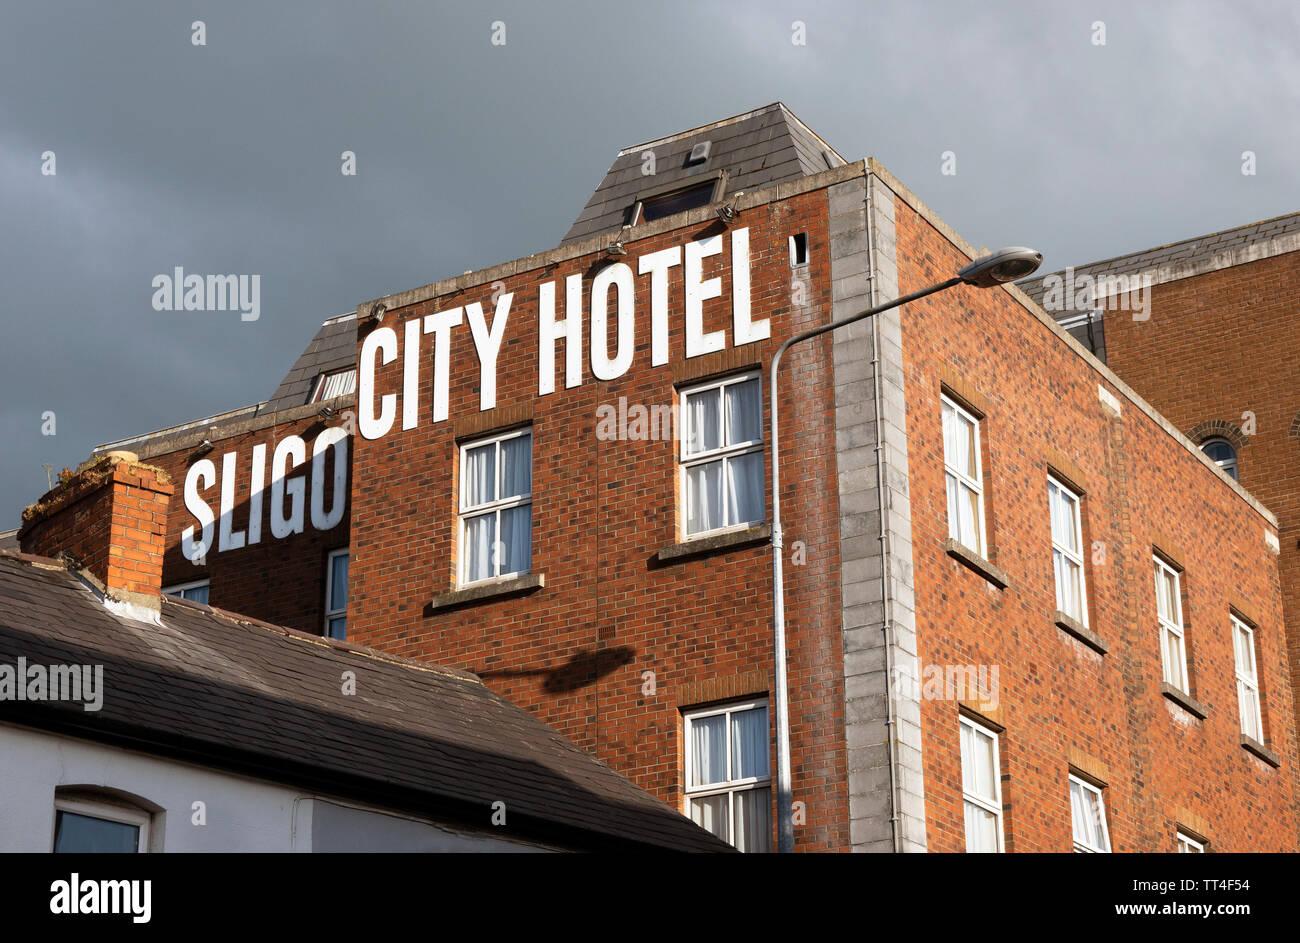 Sligo City Hotel in Sligo, Ireland - Stock Image